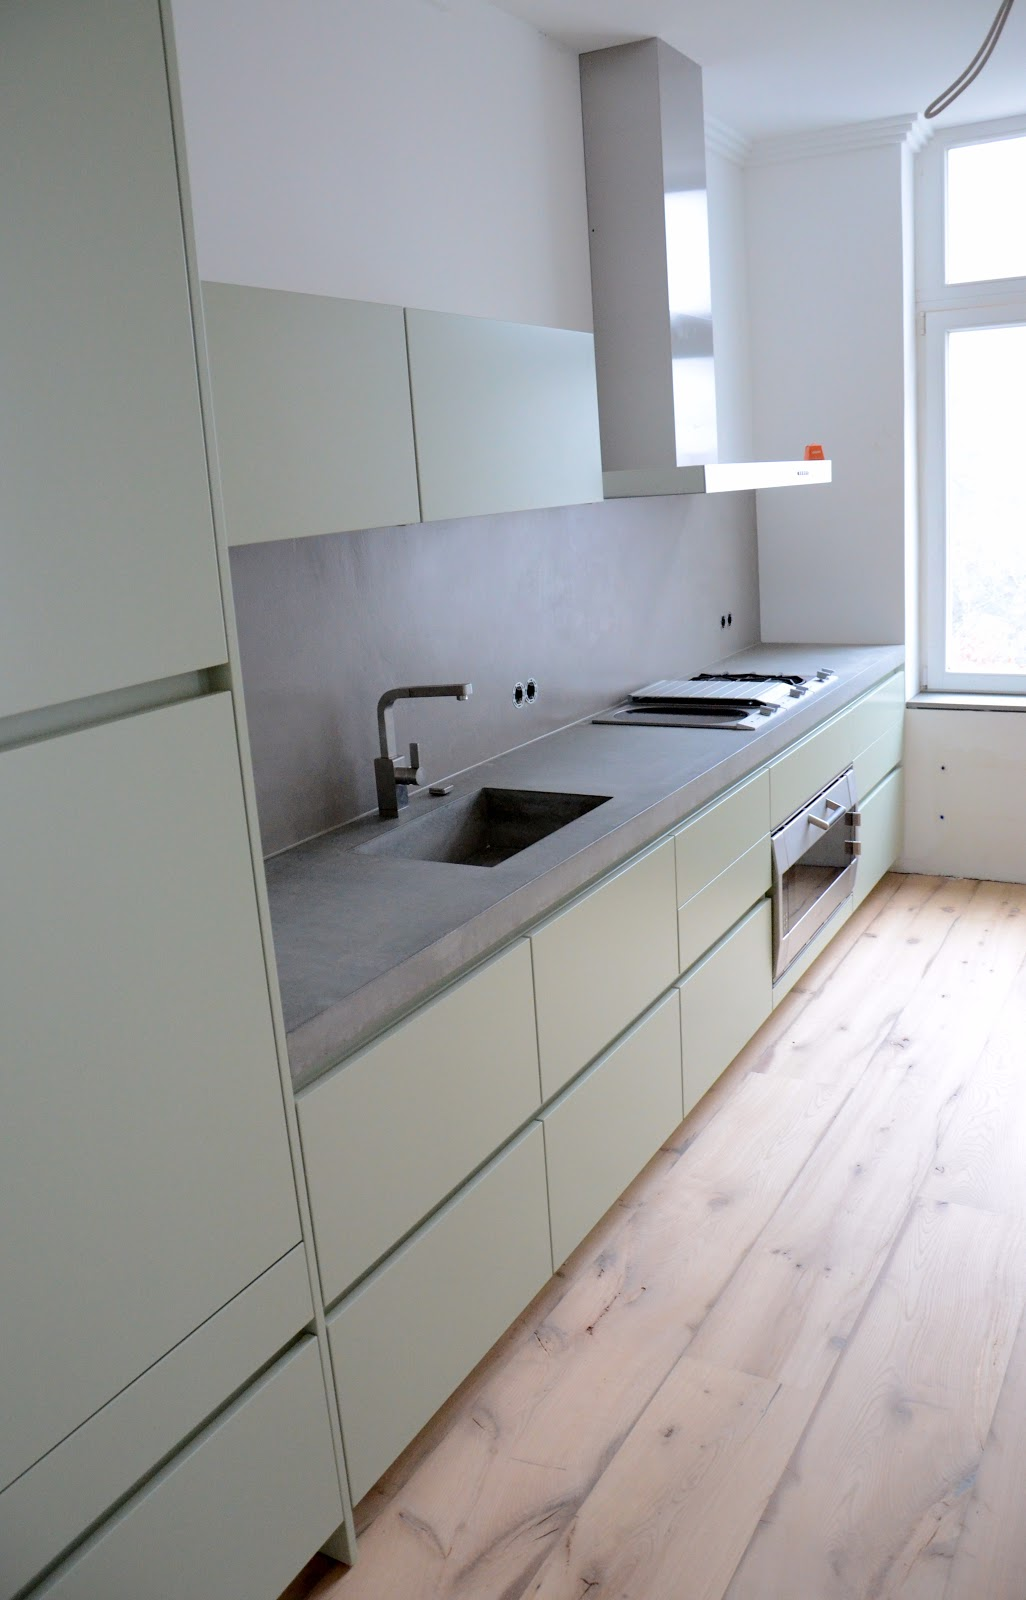 Beton Arbeitsplatte Küche beton arbeitsplatte küche acjsilva com